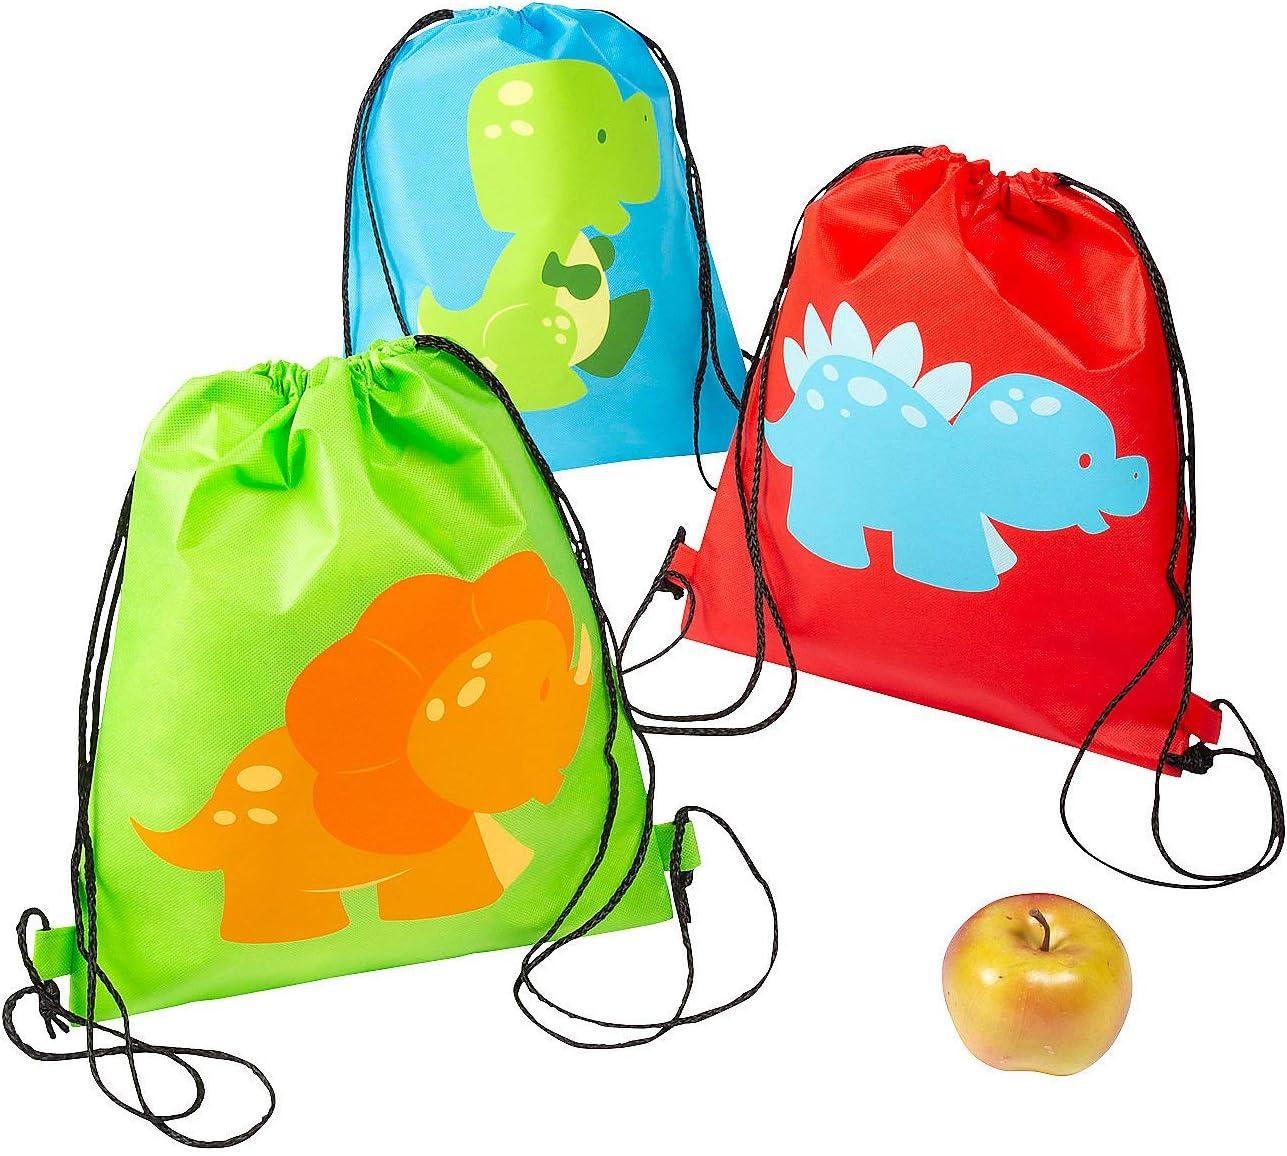 Personalised Dinosaur Cotton Drawstring Storage Birthday Gift Bag Age 1 2 3 4